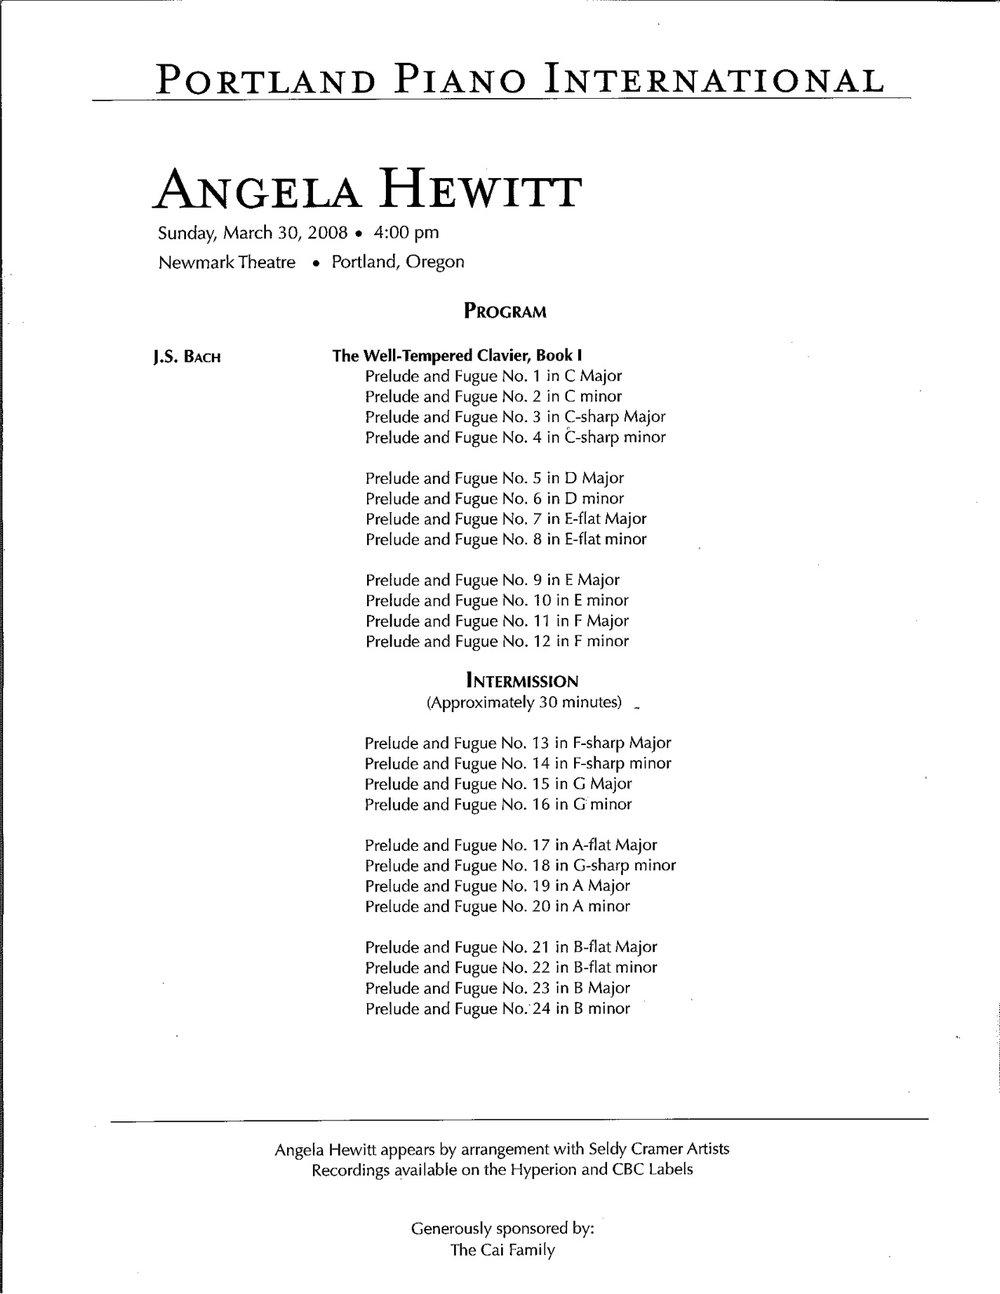 Hewitt_Program2.jpg